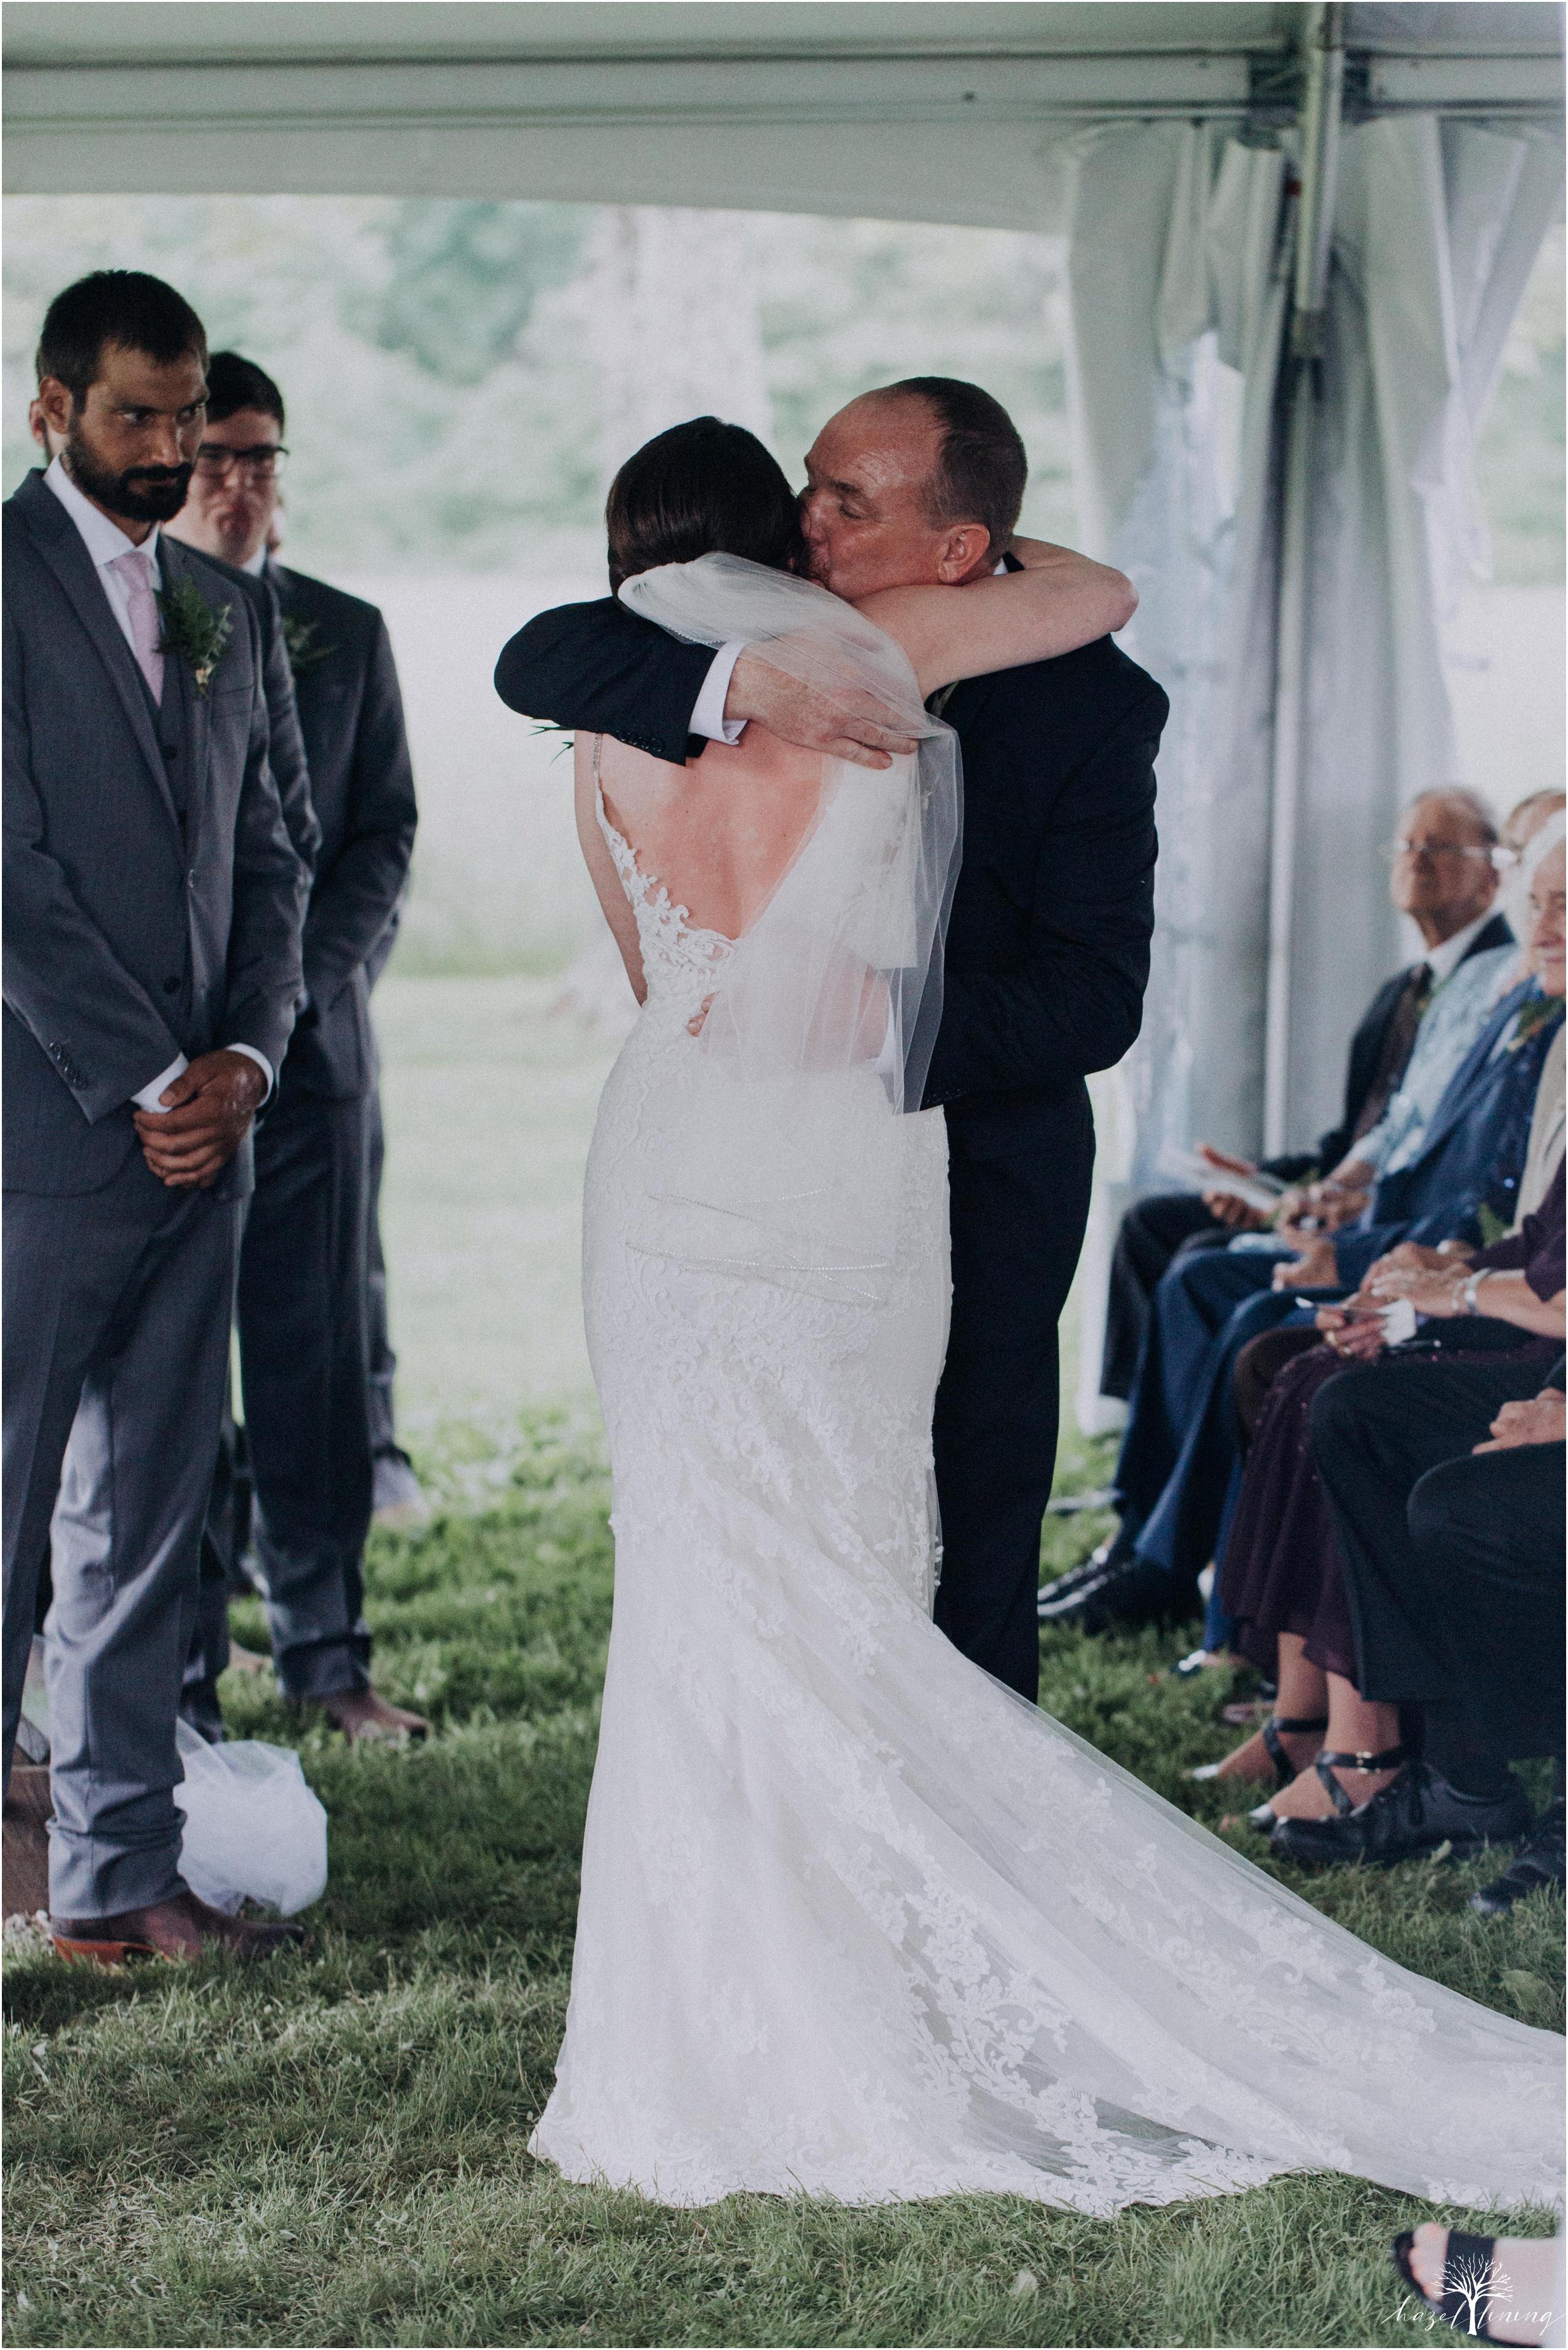 hazel-lining-travel-wedding-elopement-photography-lisa-landon-shoemaker-the-farm-bakery-and-events-bucks-county-quakertown-pennsylvania-summer-country-outdoor-farm-wedding_0055.jpg